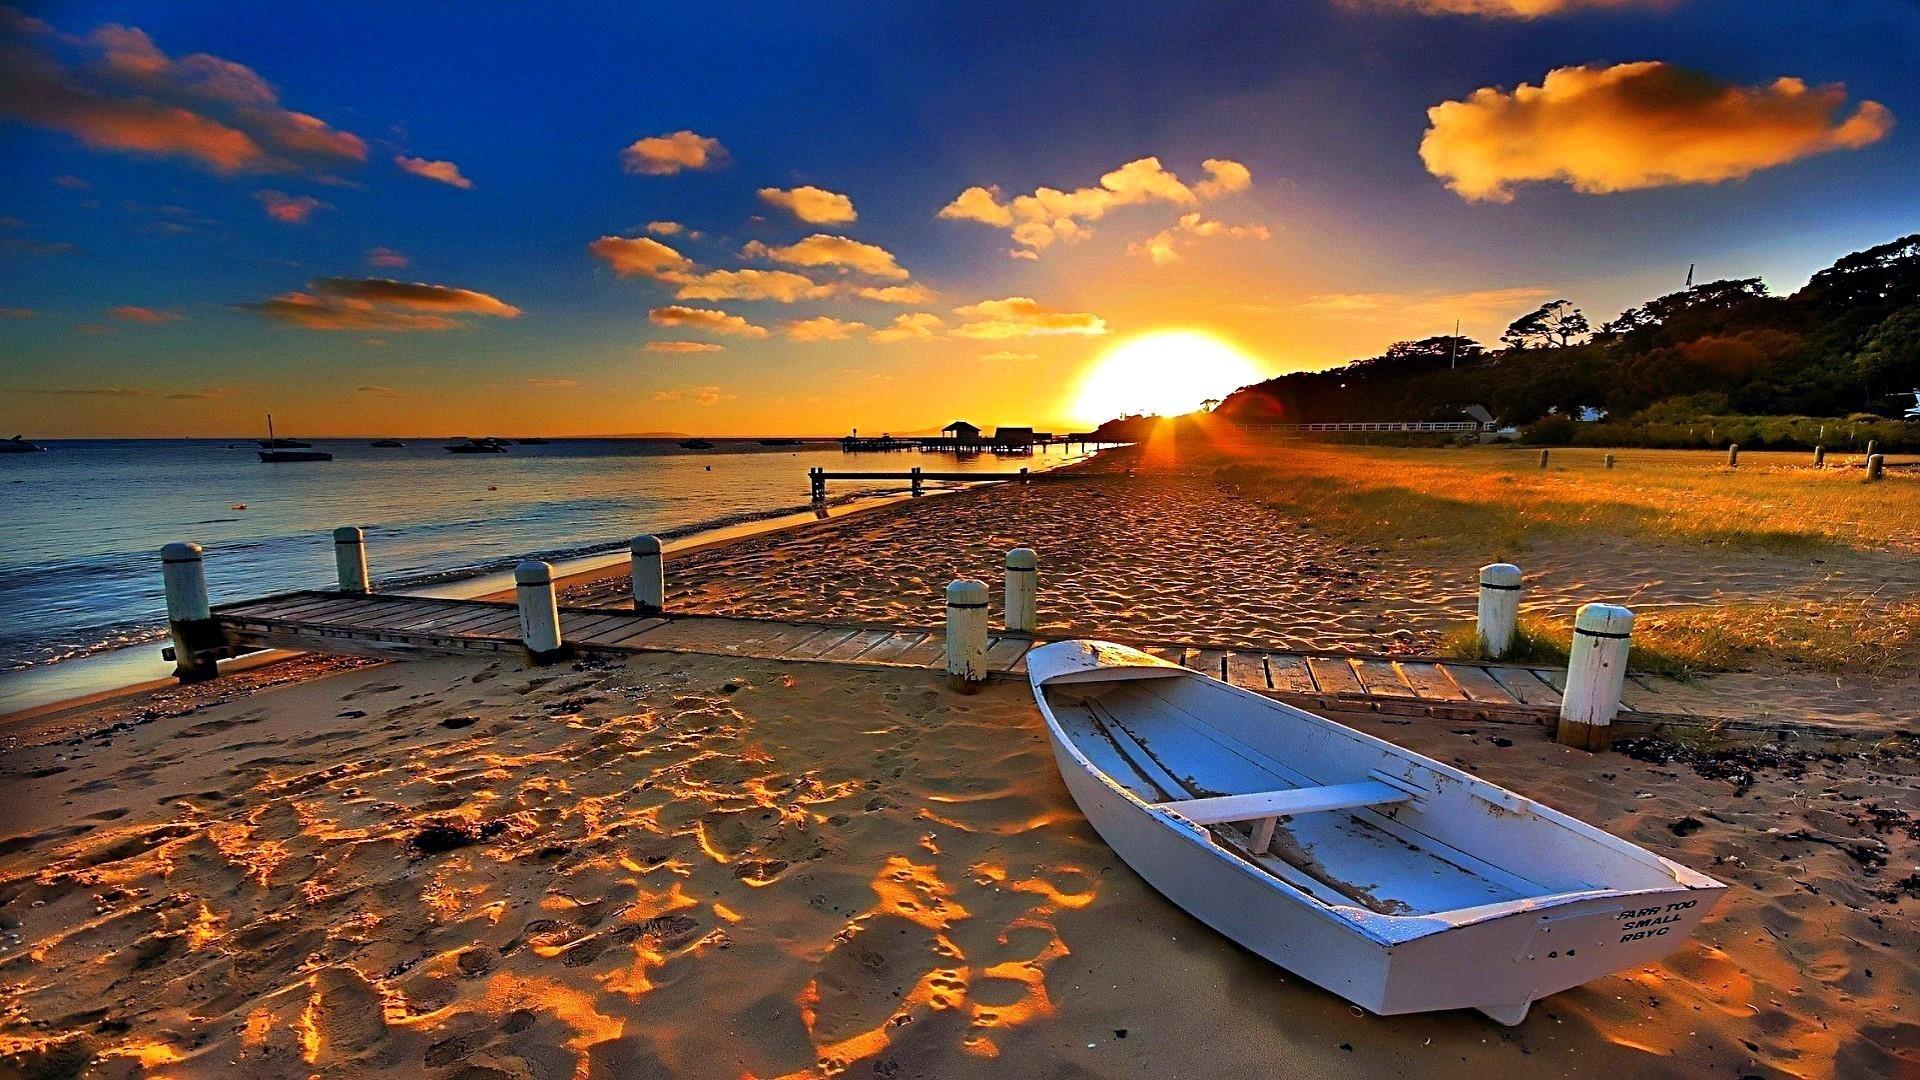 sunset on the beach wallpaper | wallpaper studio 10 | tens of